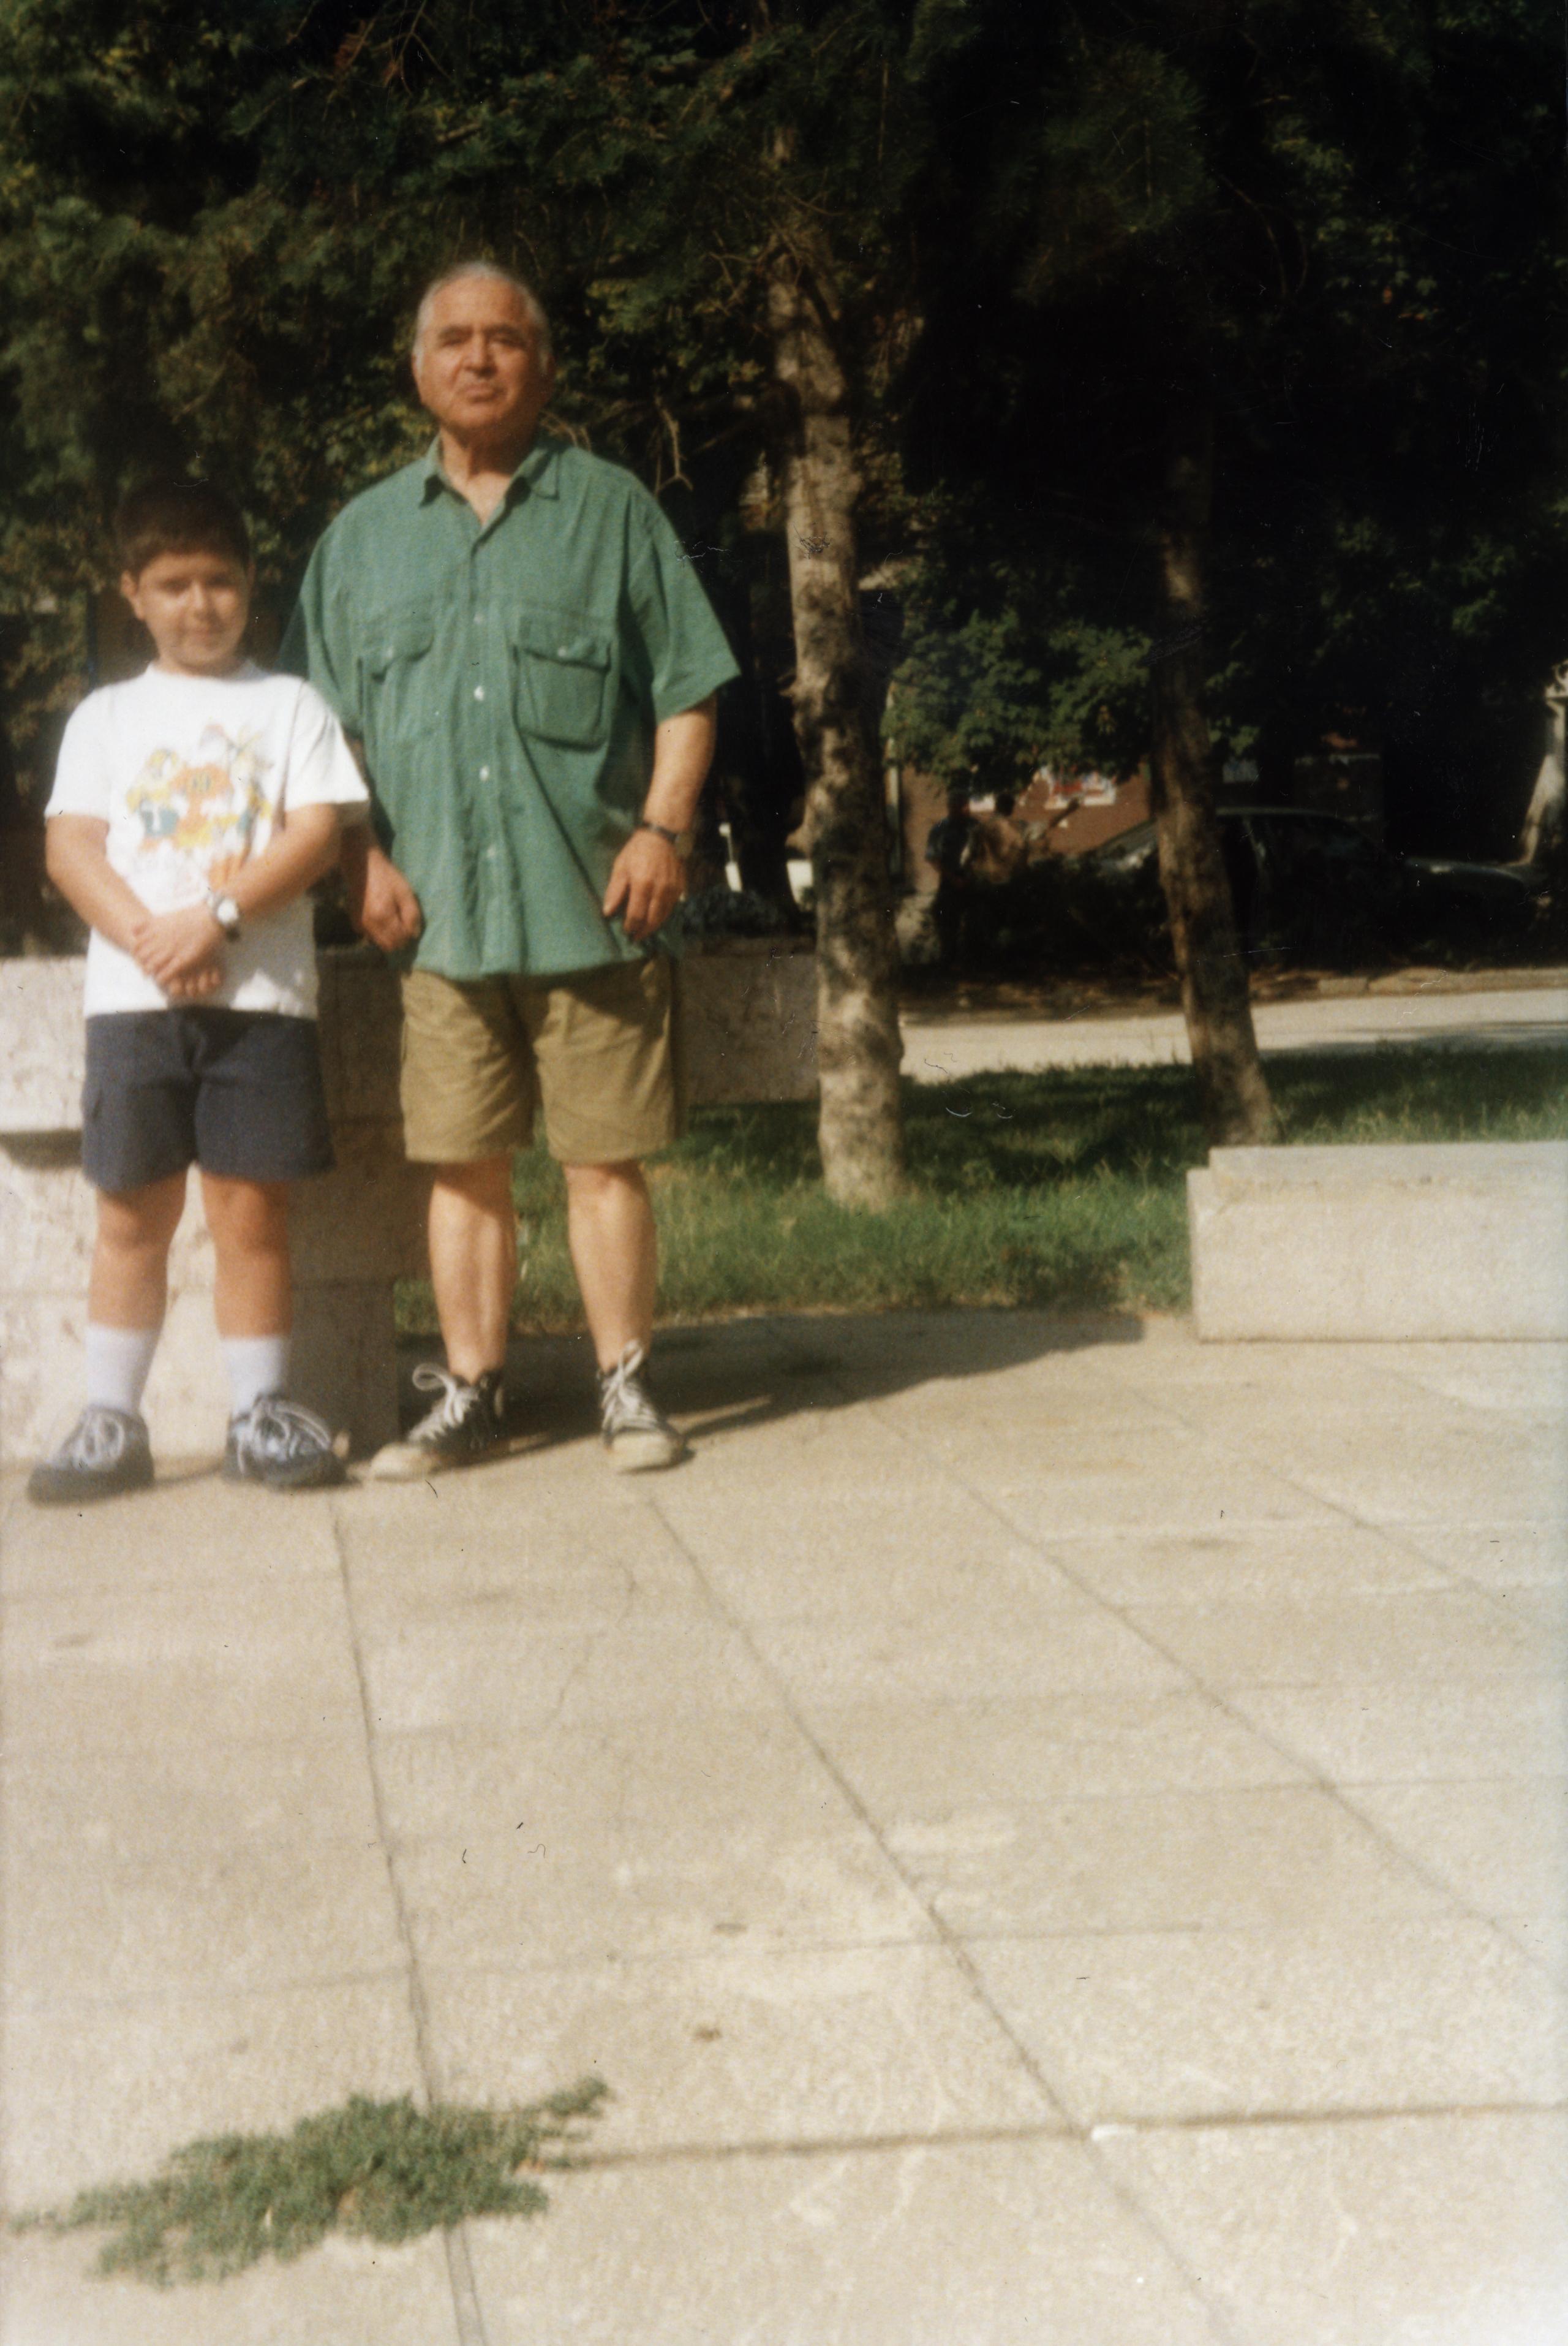 Rafael Beraha with his grandson Avishay Beraha